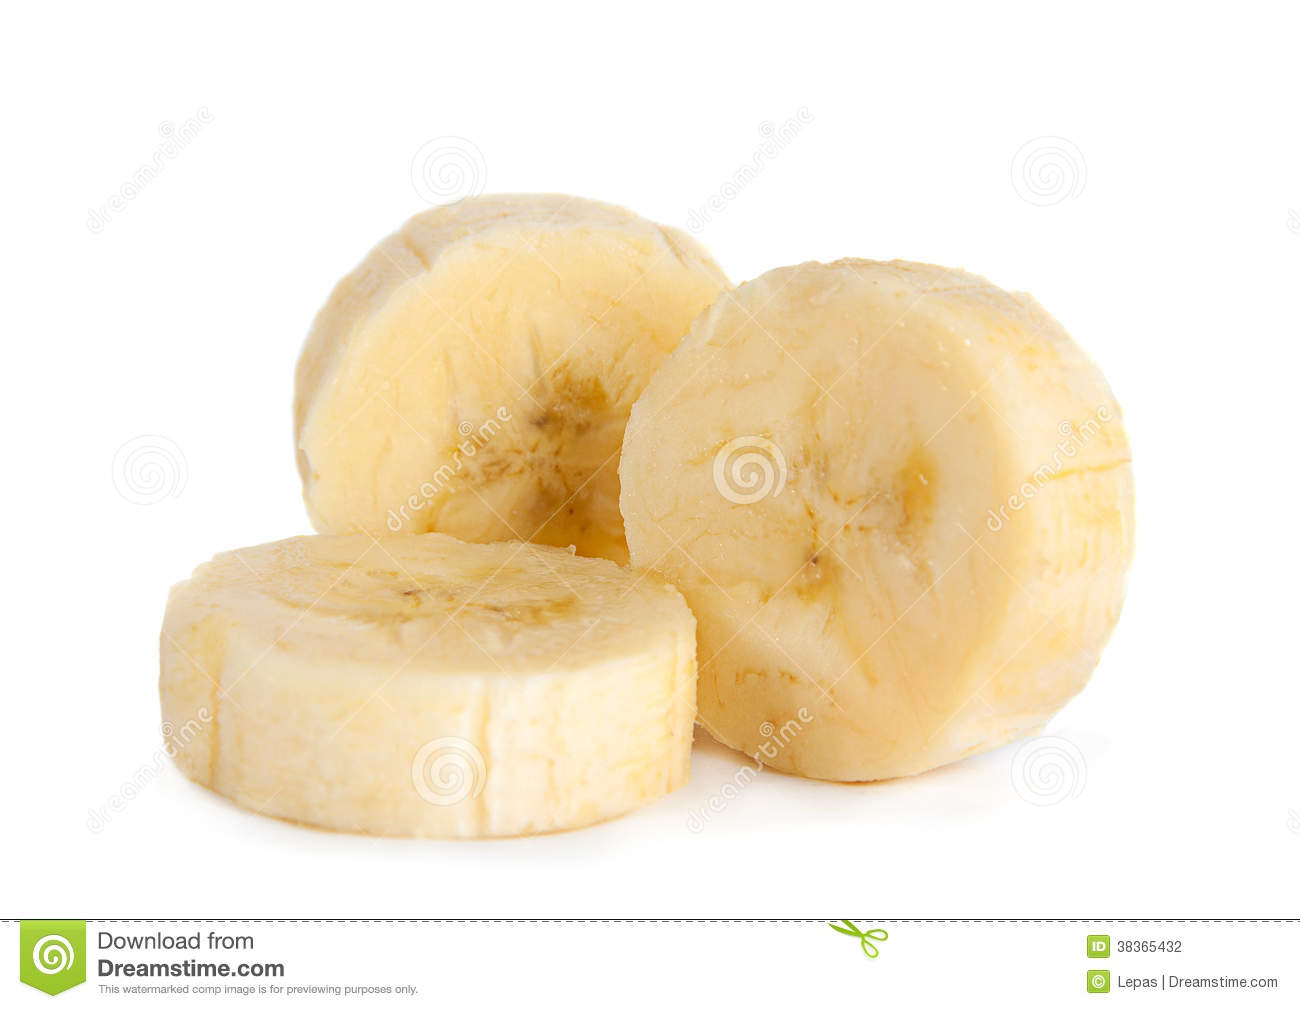 Banana slice closeup stock photo. Image of food, tropical.